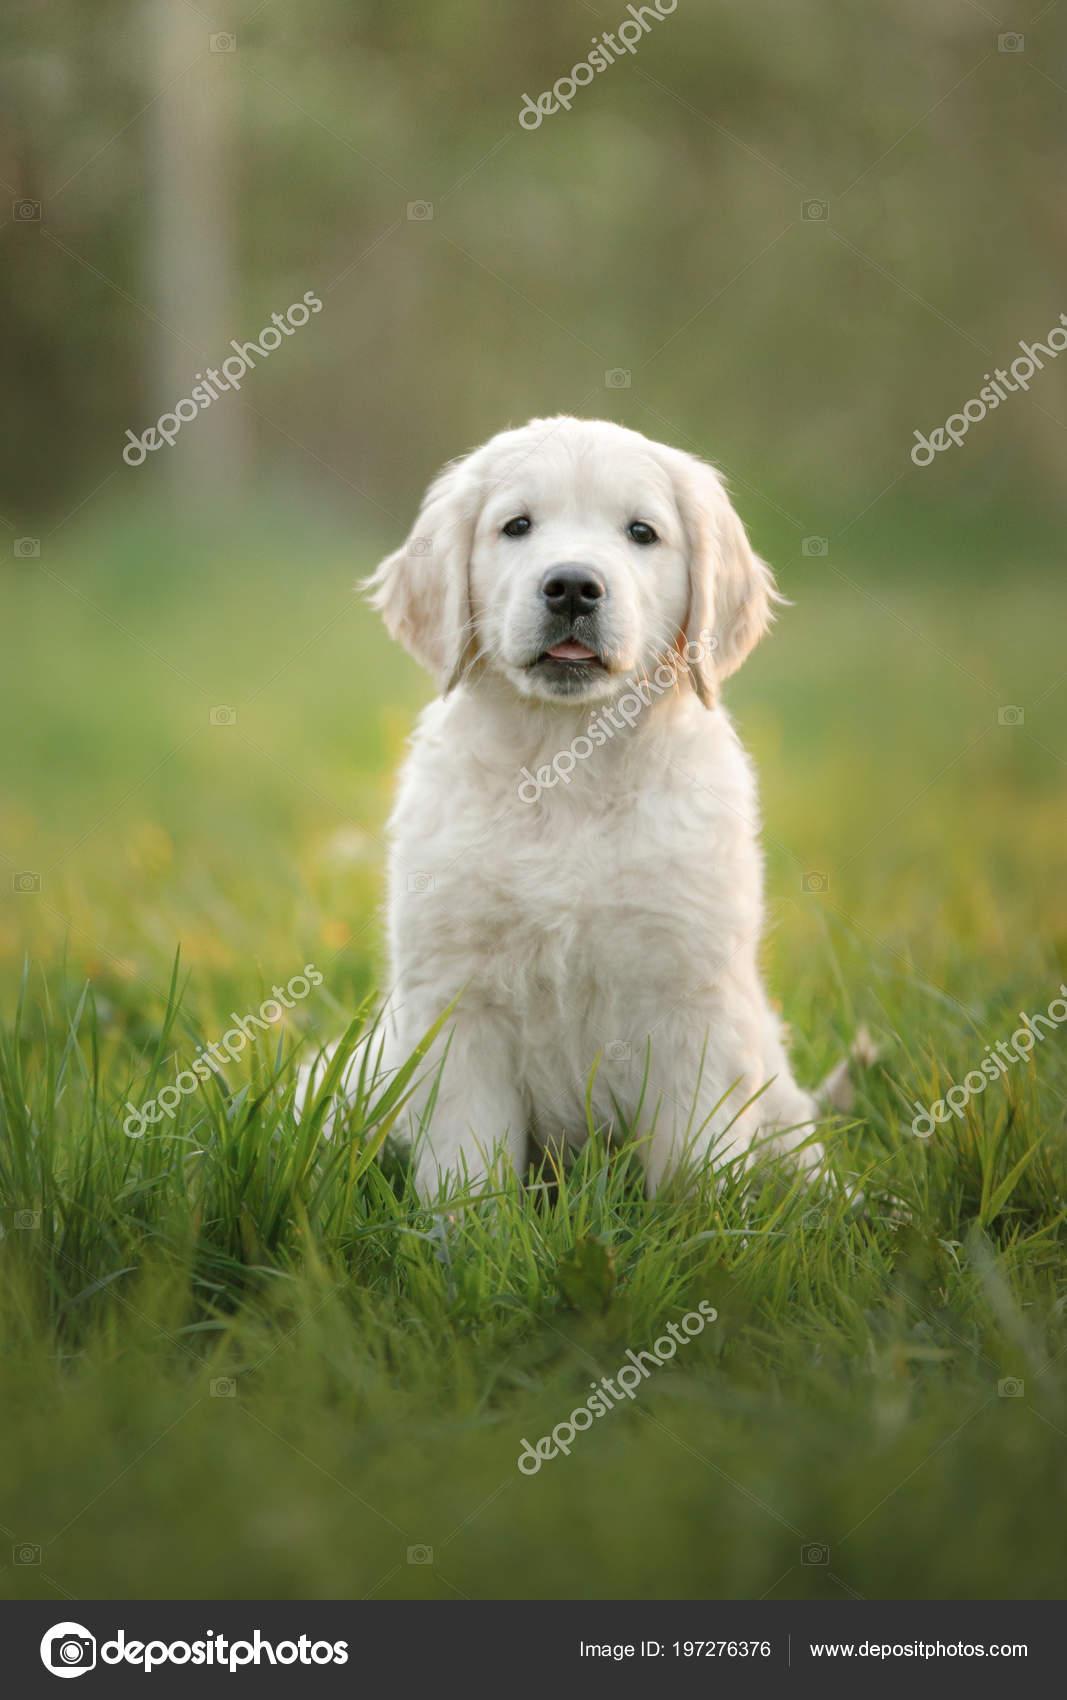 Golden Retriever Puppy Runs On Grass And Plays Stock Photo